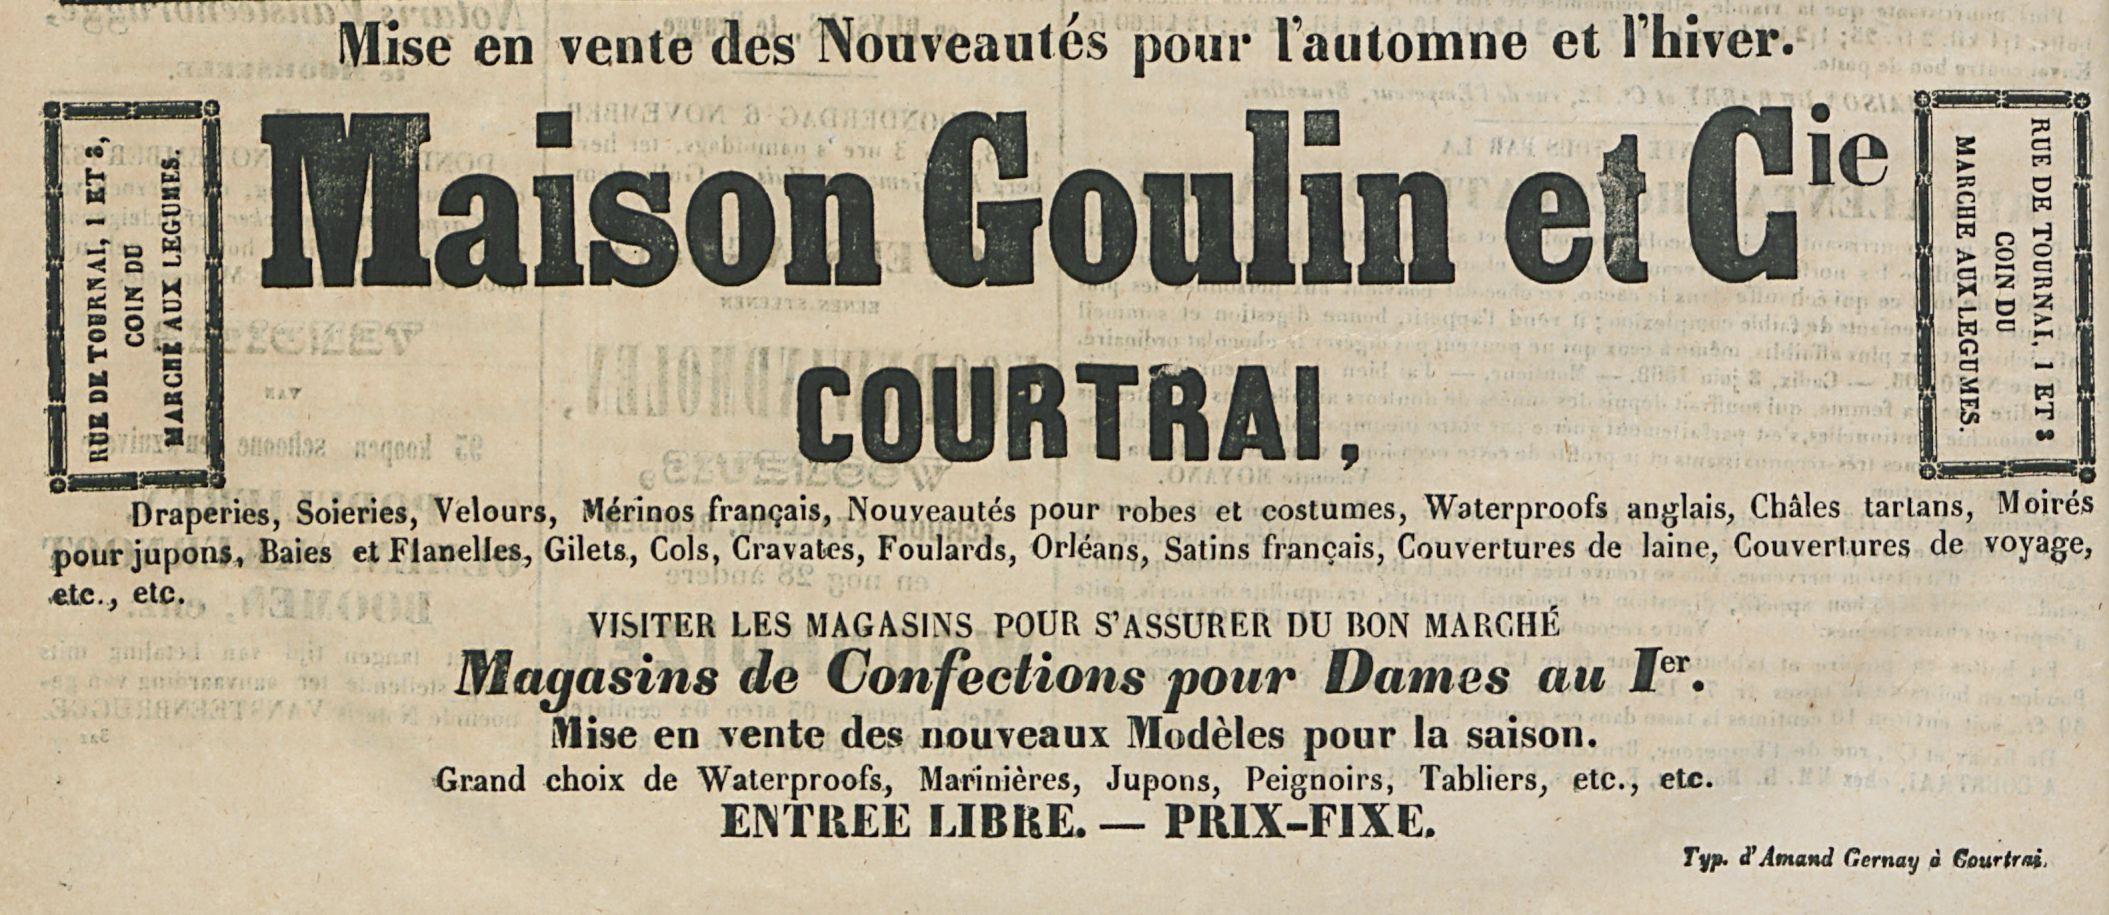 Maison Goulin et cie